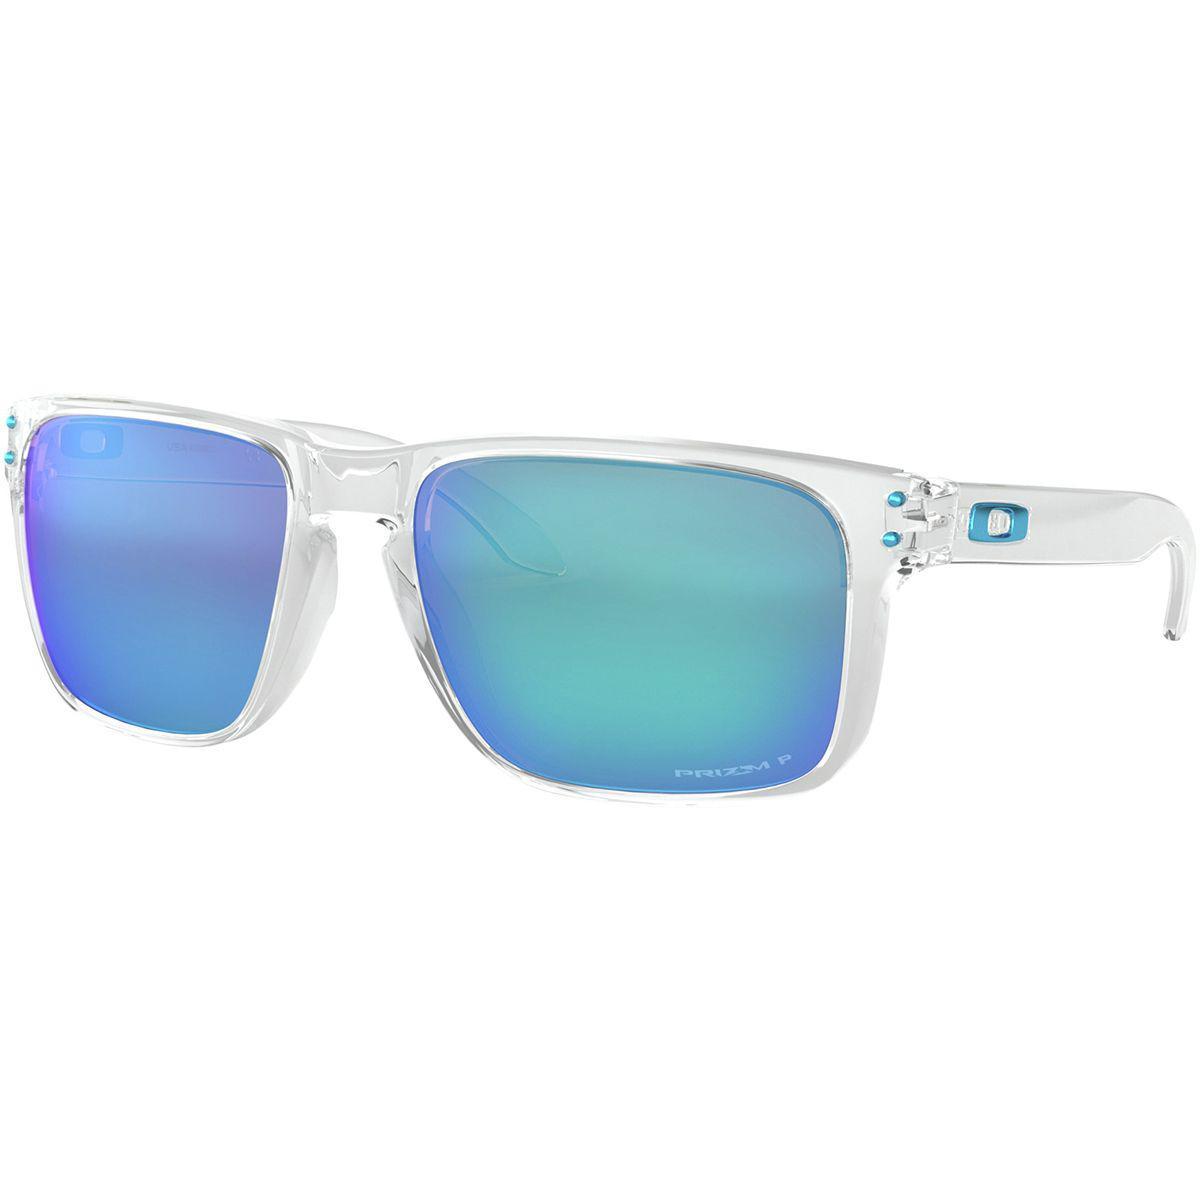 800c40d0ce6 Lyst - Oakley Holbrook Xl Prizm Polarized Sunglasses in Blue for Men